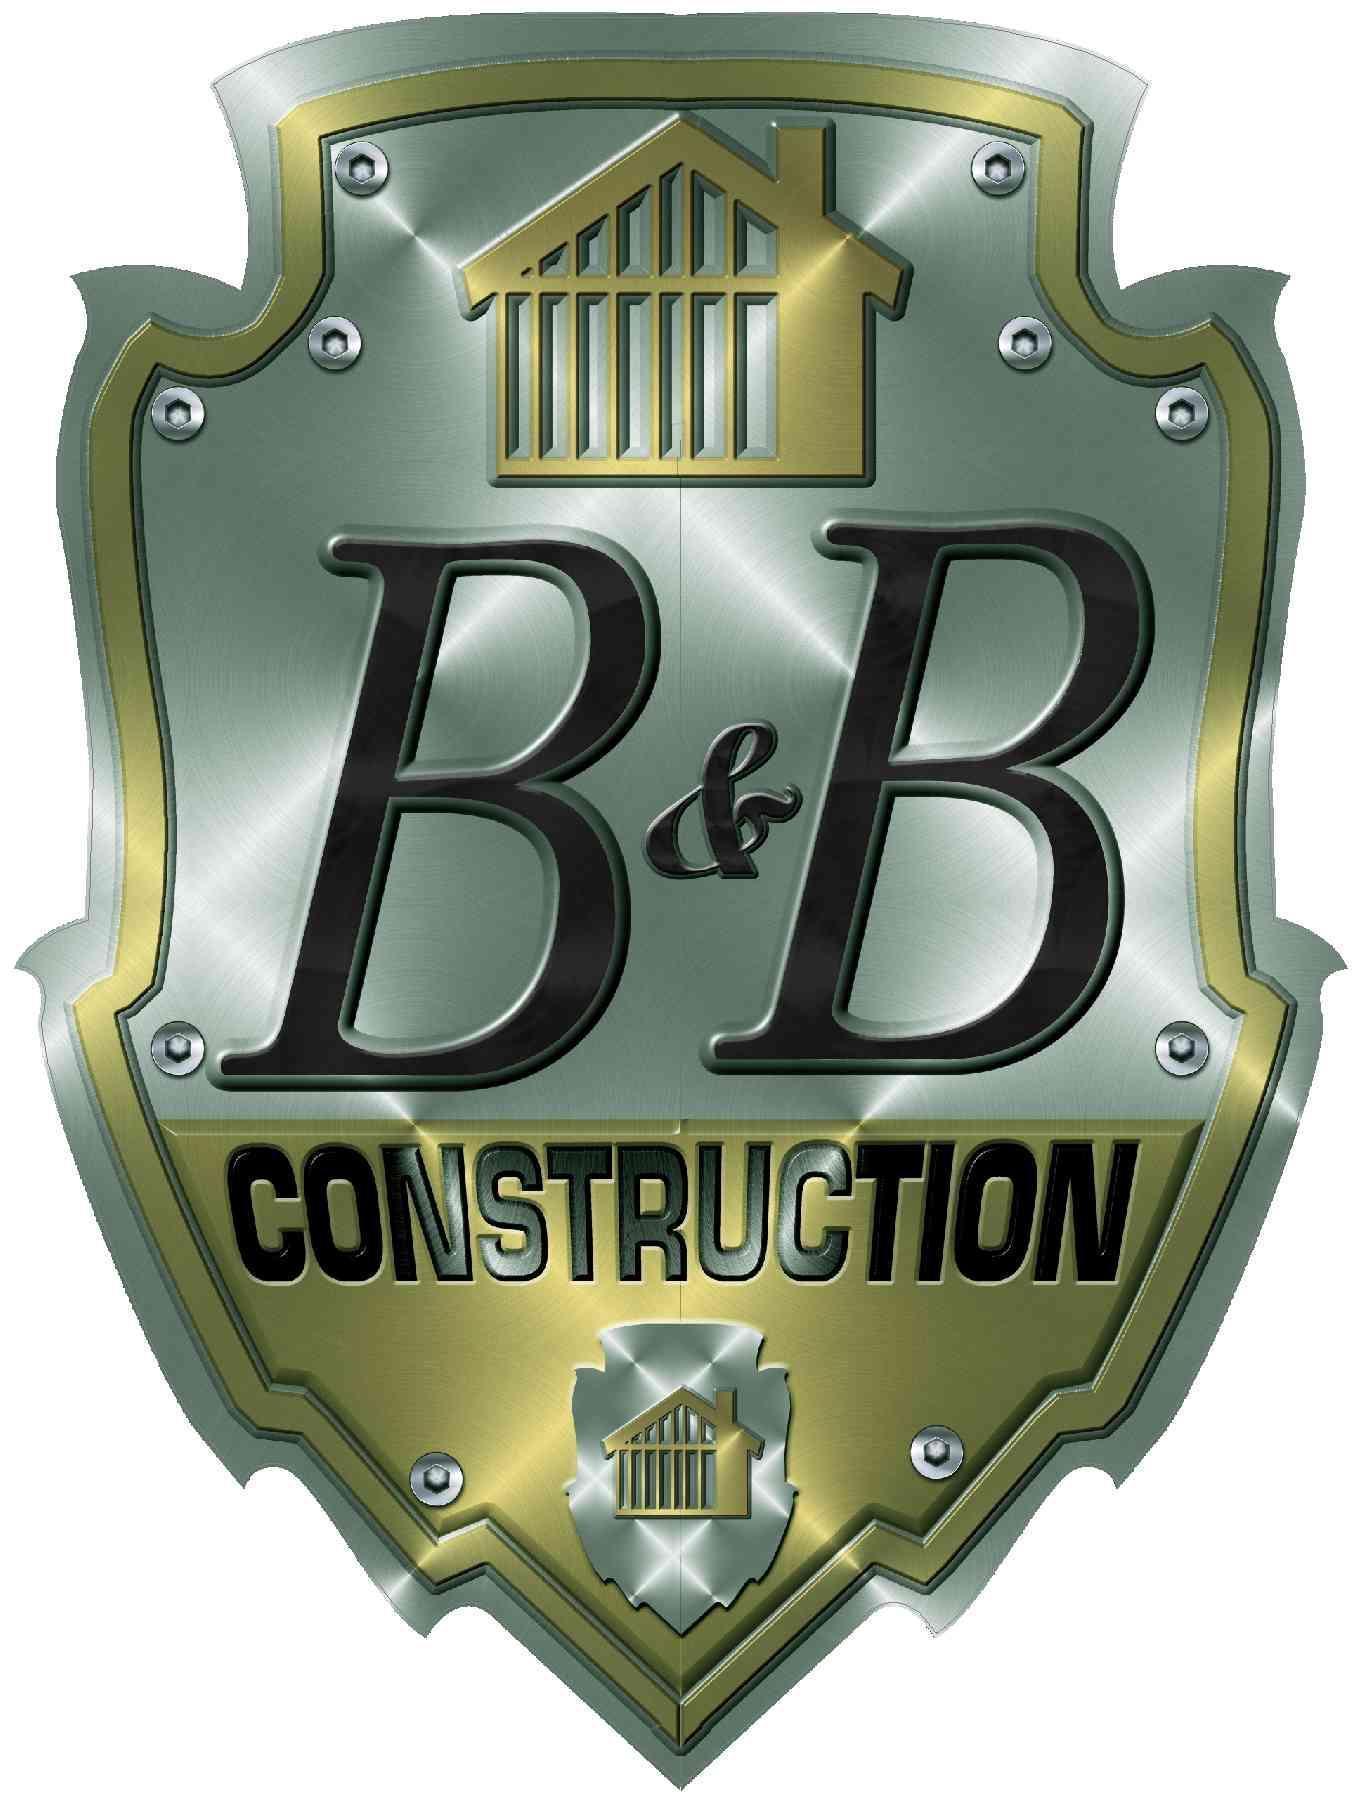 B&B Construction